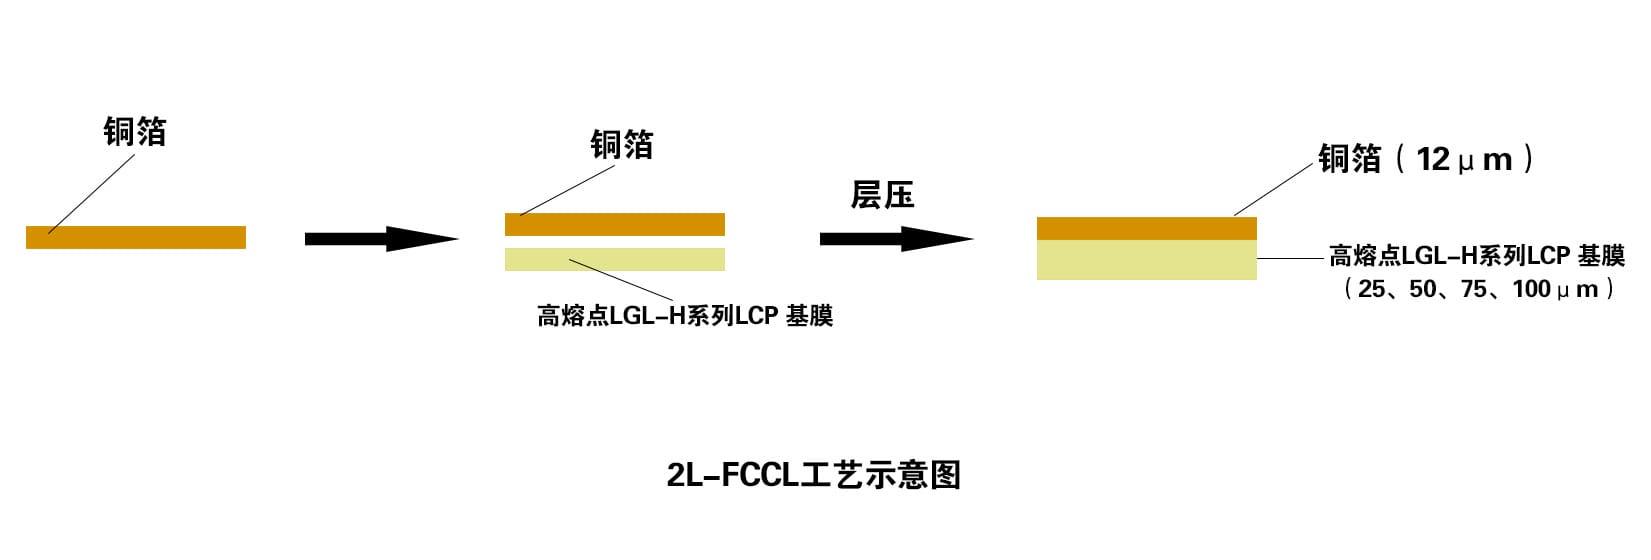 2L-FCCL工艺示意图-单面.jpg